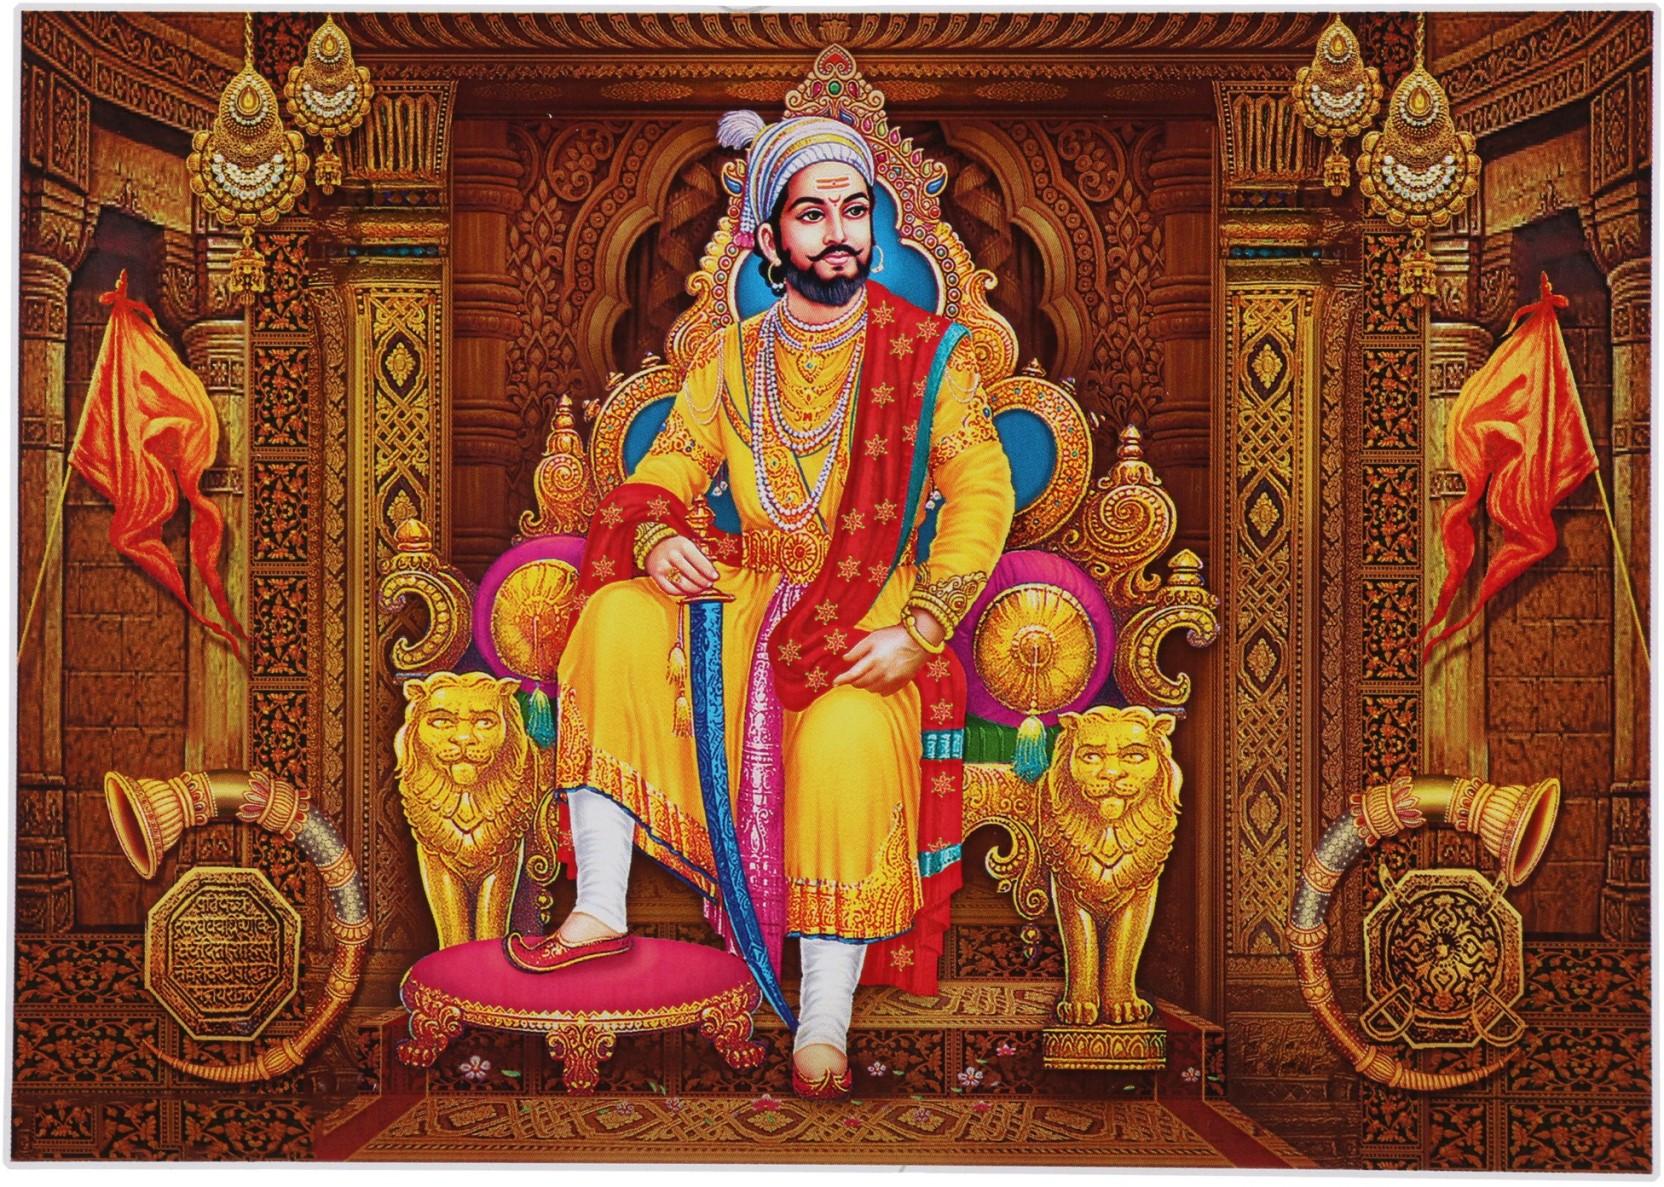 Chhatrapati Shivaji Maharaj Original Images Shivaji Maharaj Unfram...